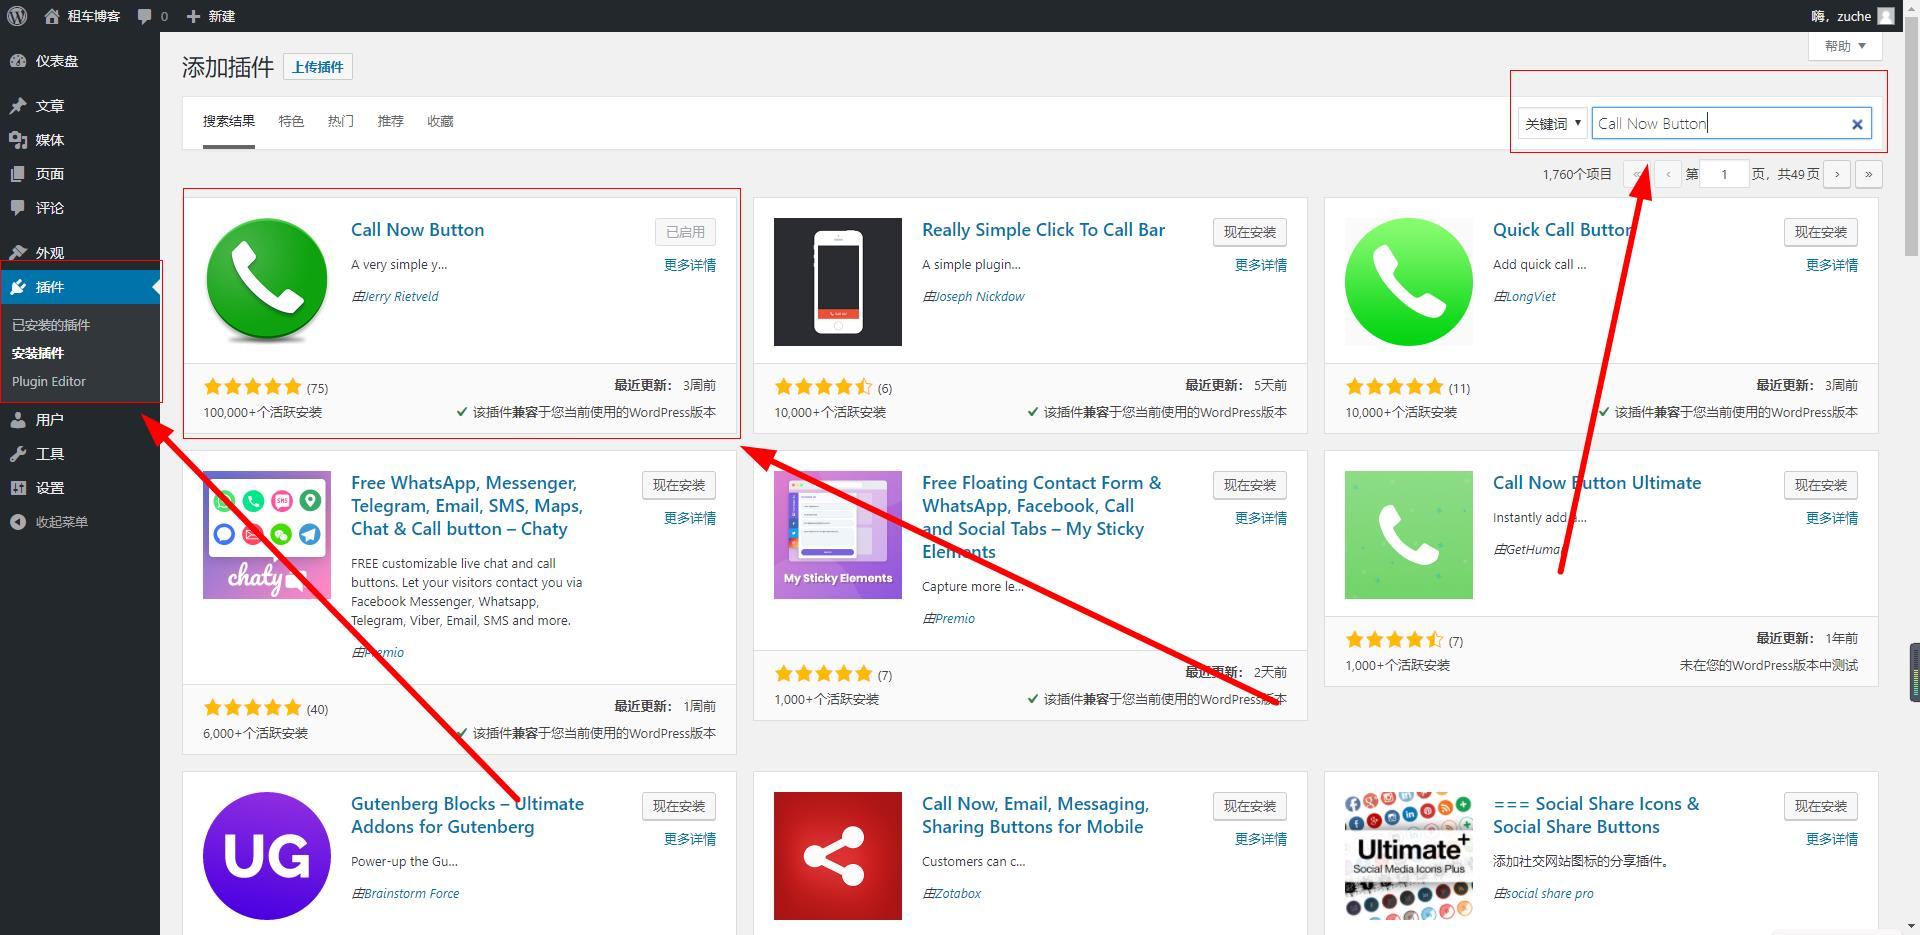 WordPress教程:使用WP插件创建手机端底部悬浮菜单